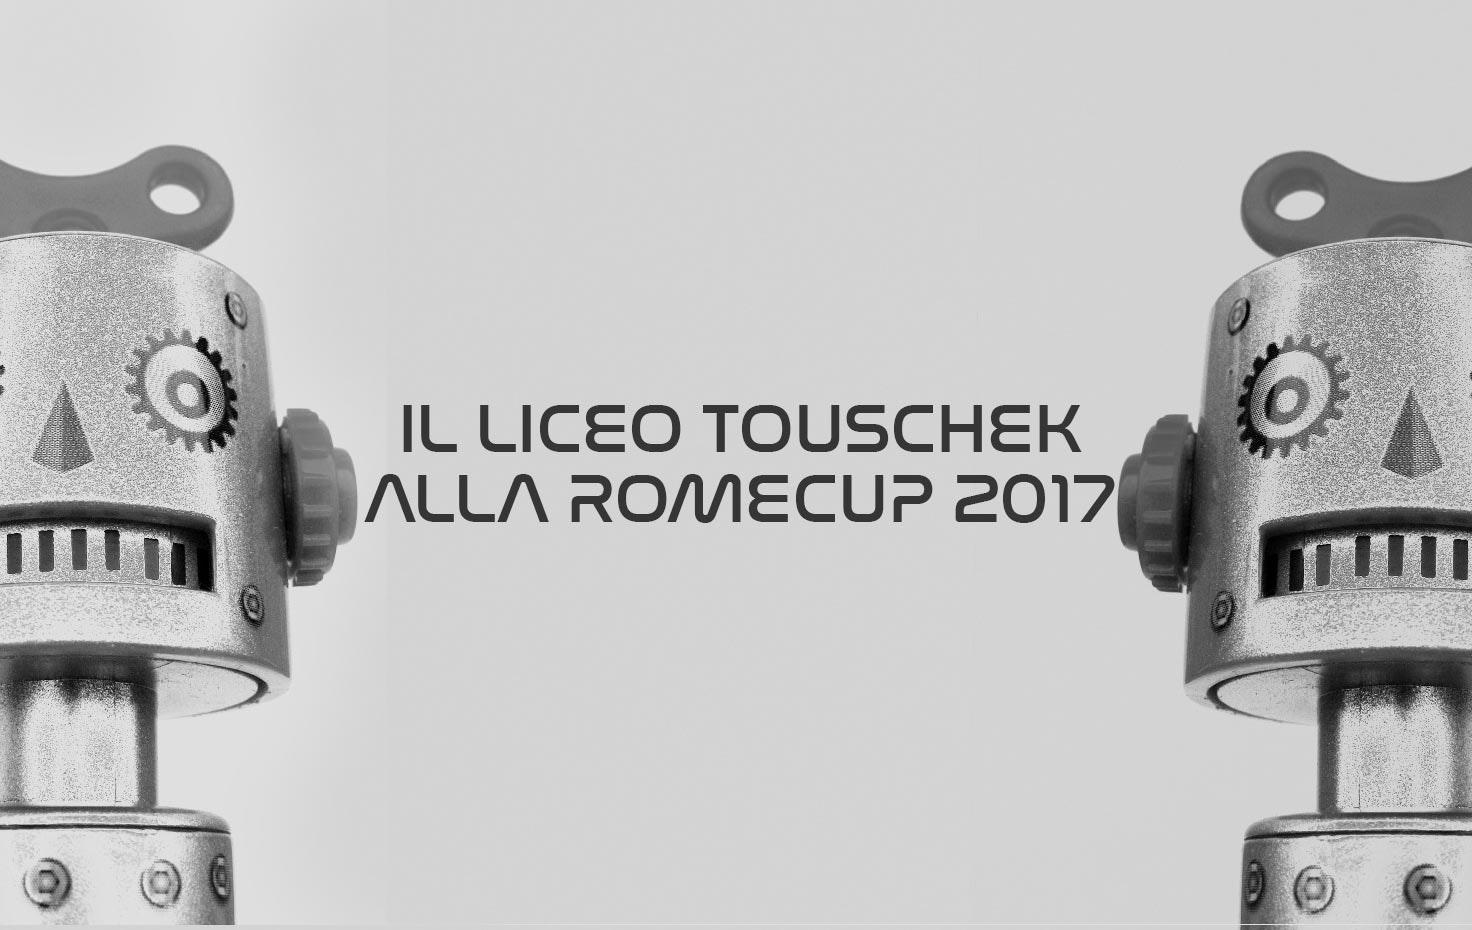 IL LICEO TOUSCHEK ALLA ROMECUP 2017